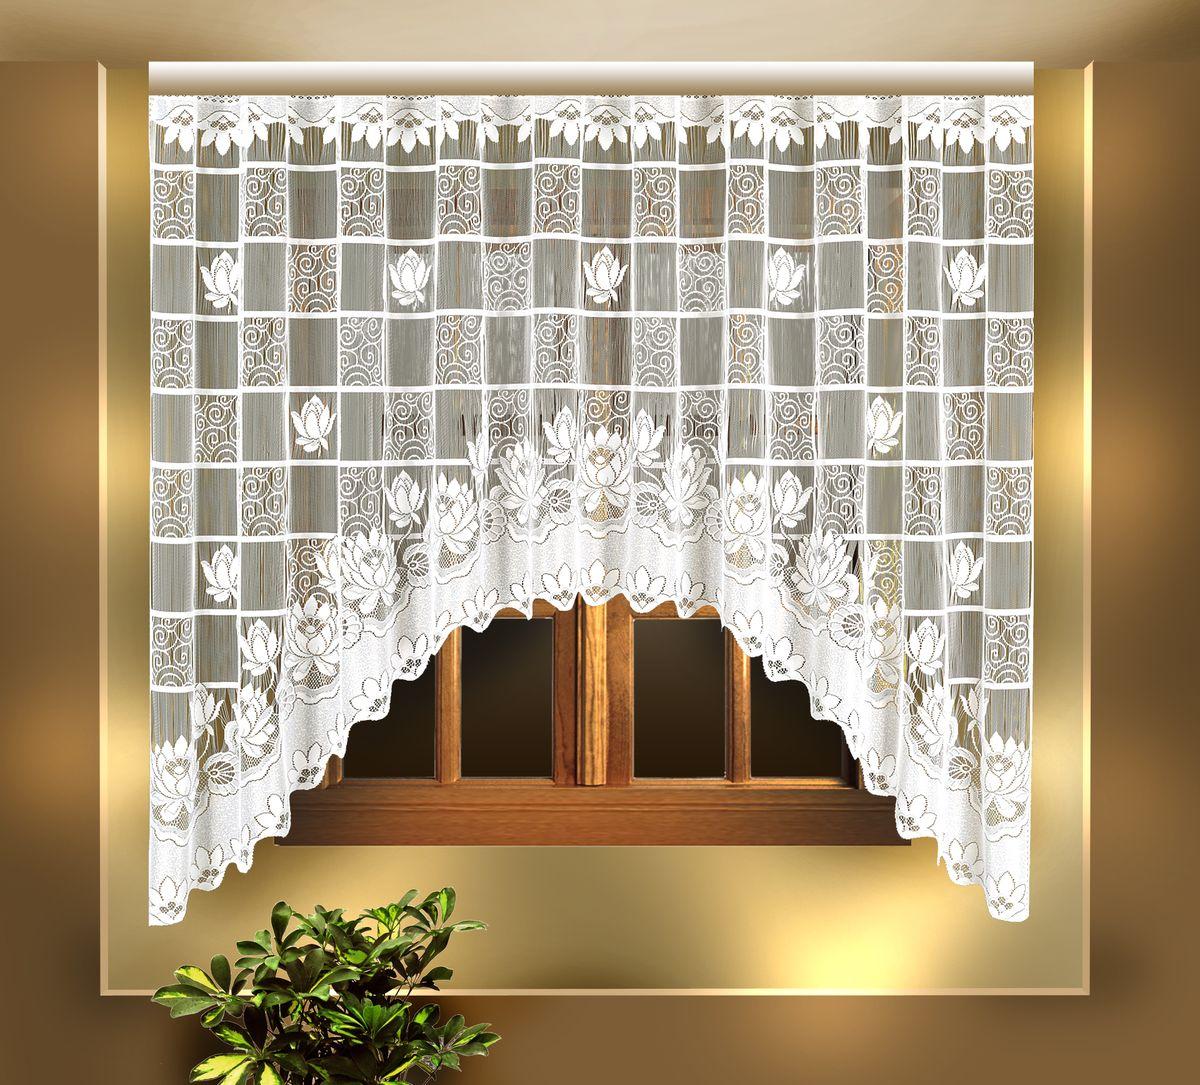 Гардина Zlata Korunka, цвет: белый, высота 160 см. 88809 гардина 400 175 см zlata korunka цвет белый коричневый